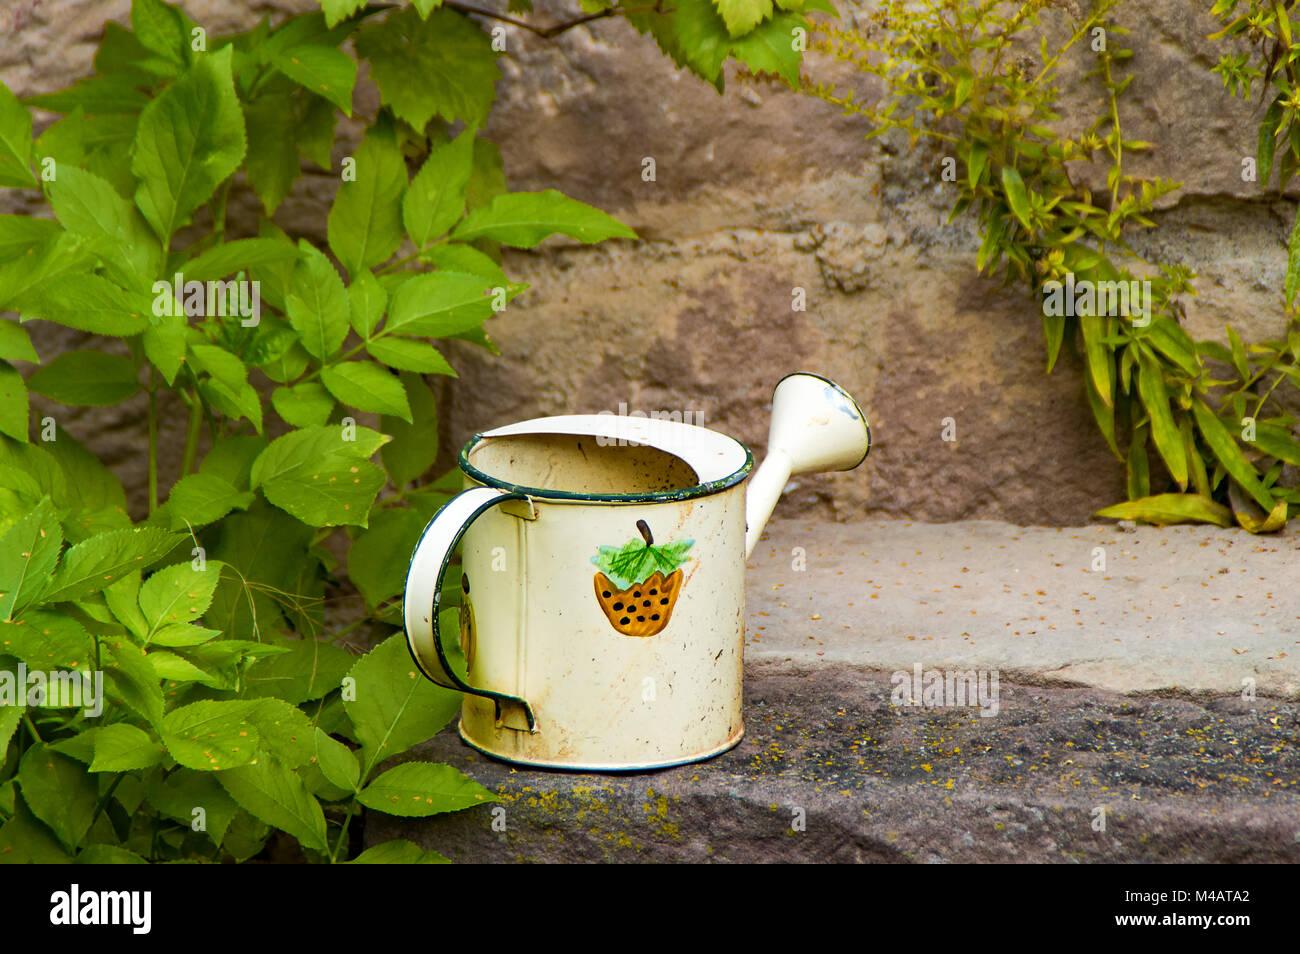 watering pot - Stock Image